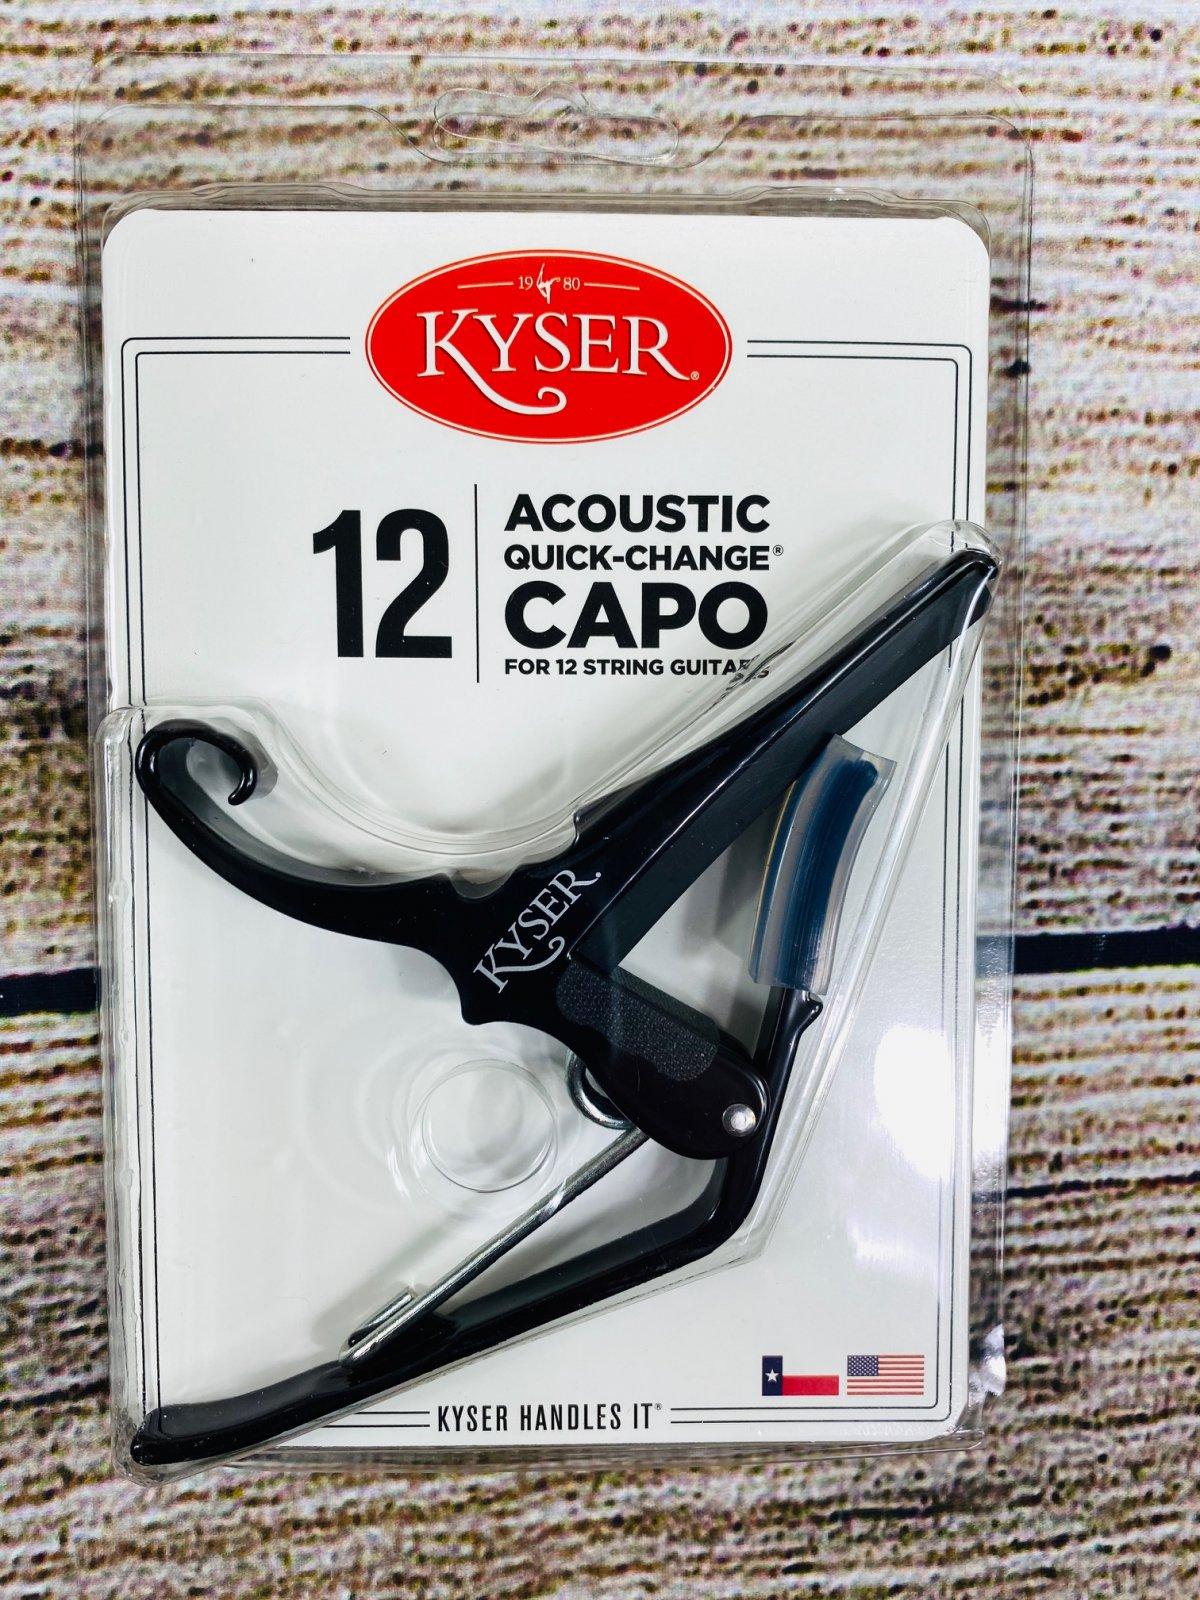 Kyser Quick-Change 12-string Guitar Capo - Black